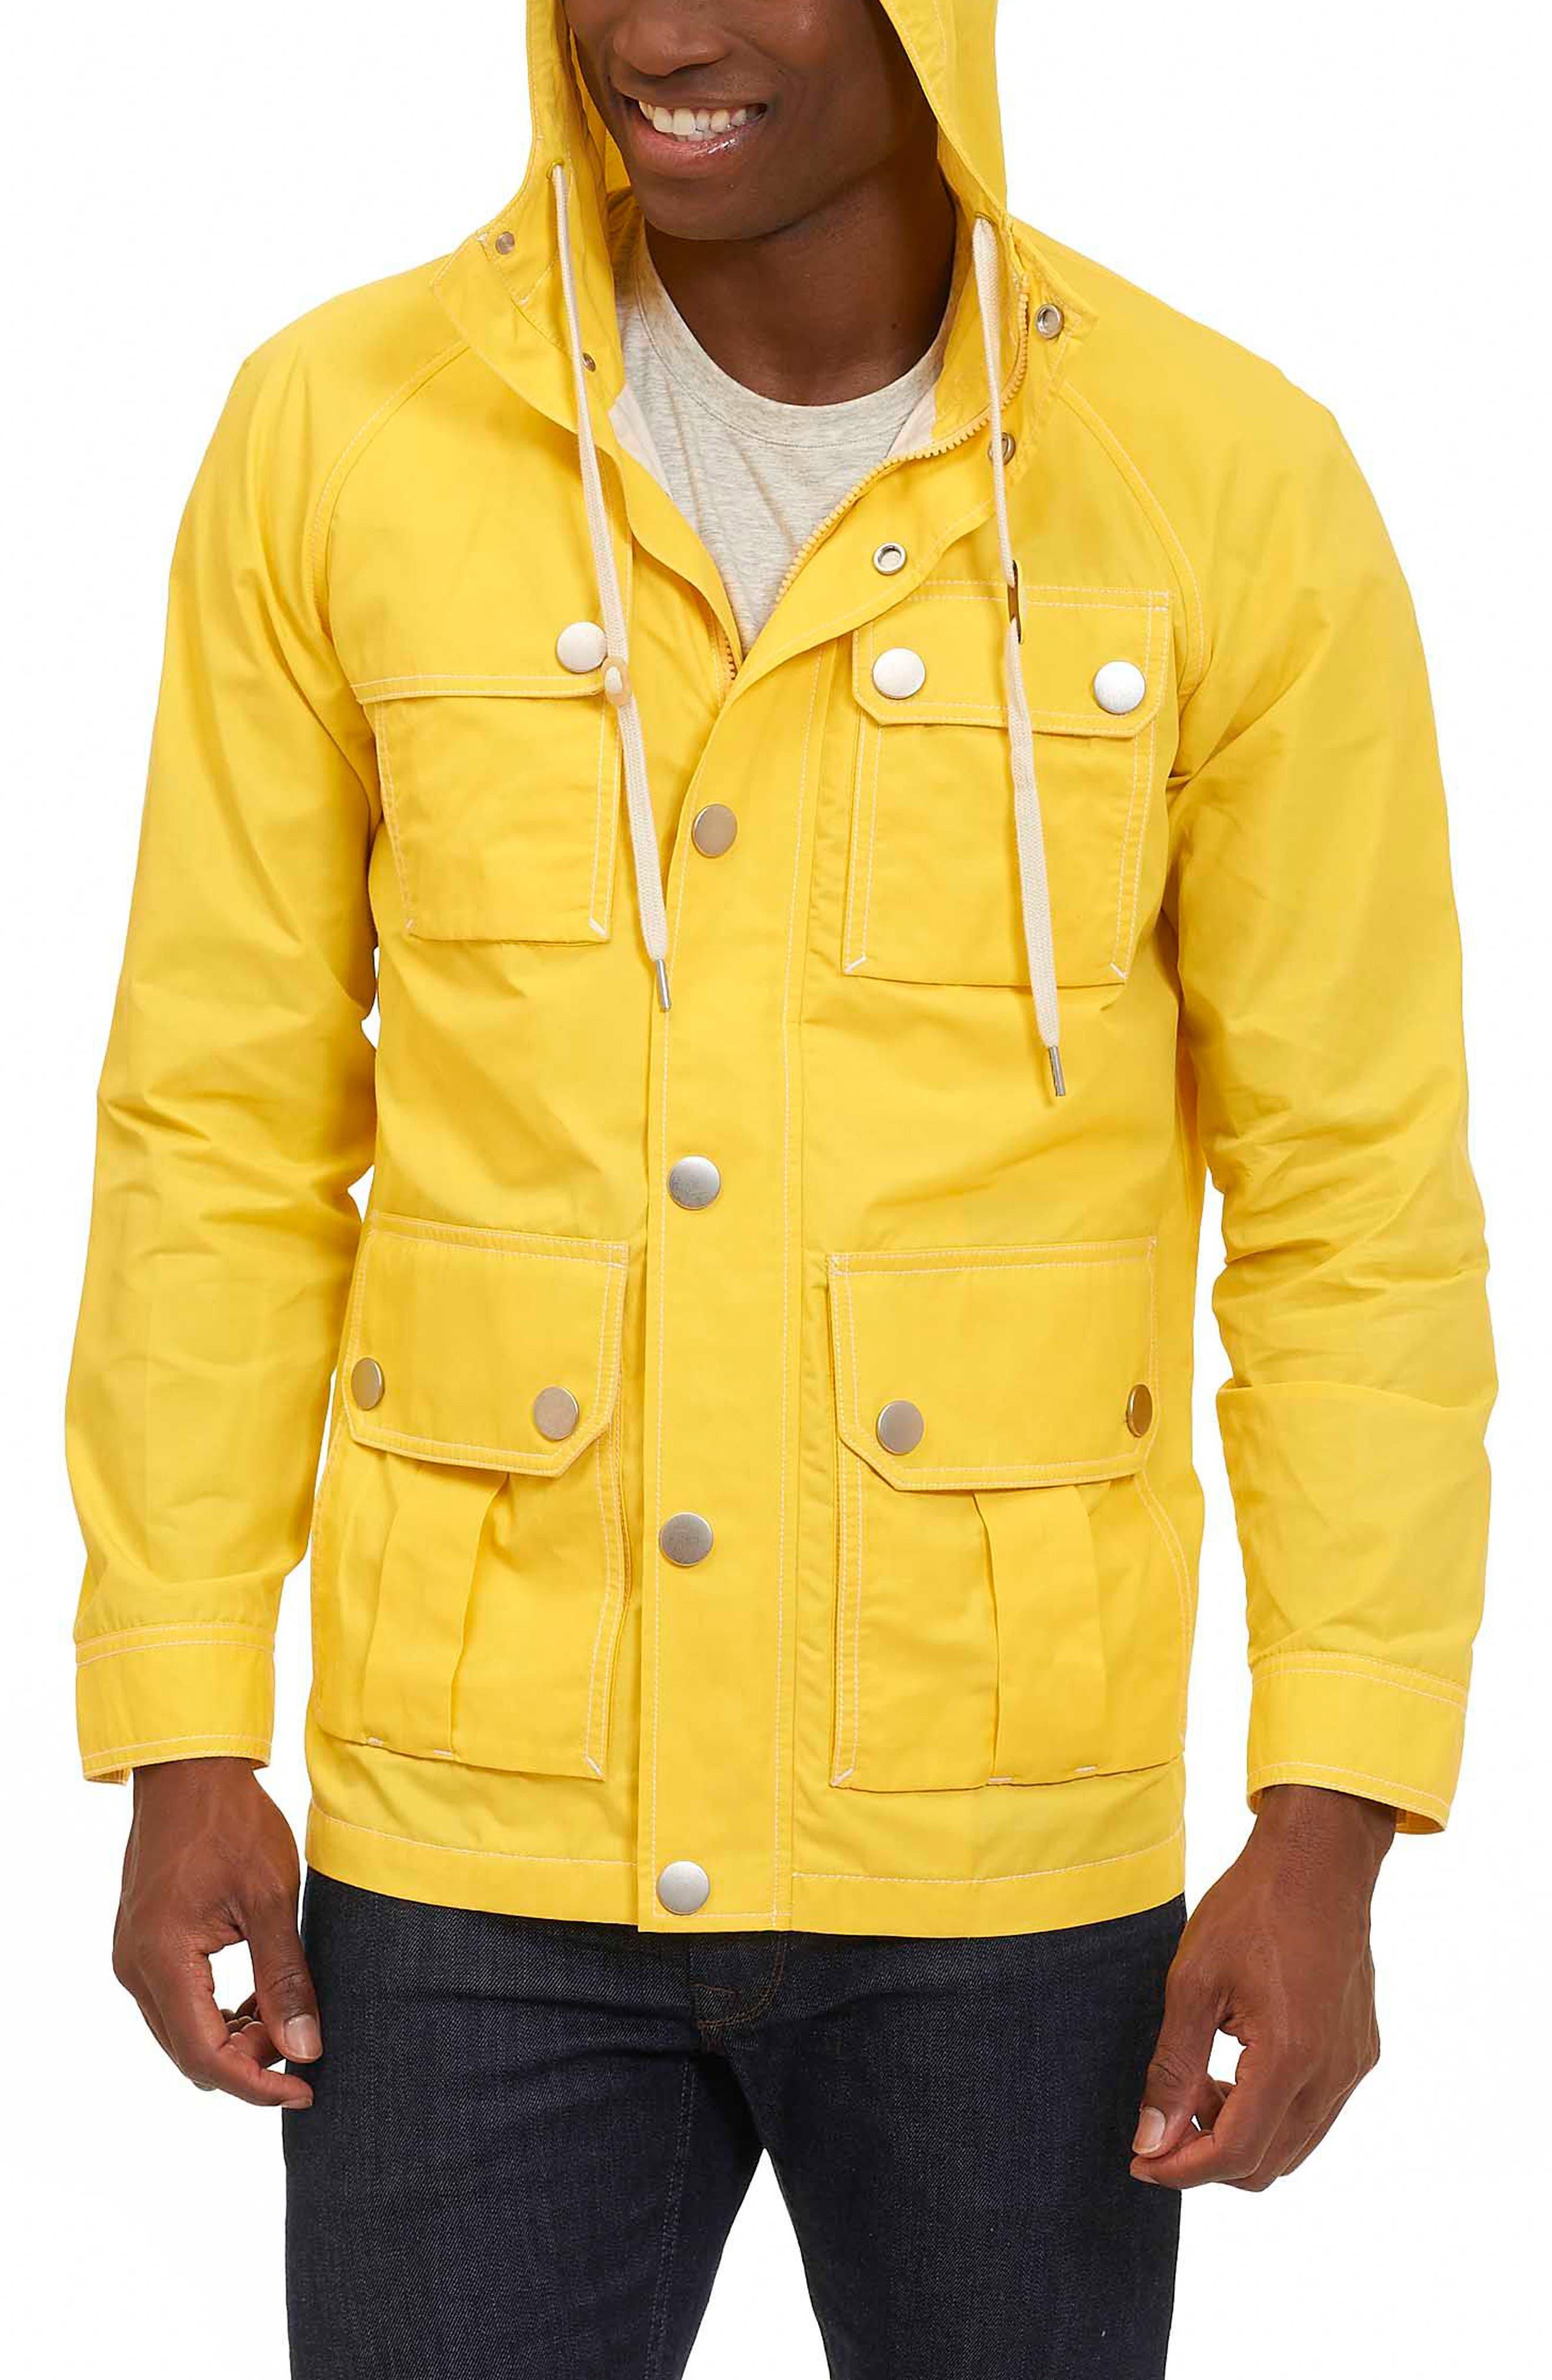 Lake Toba Water Resistant Jacket,                         Main,                         color, 700